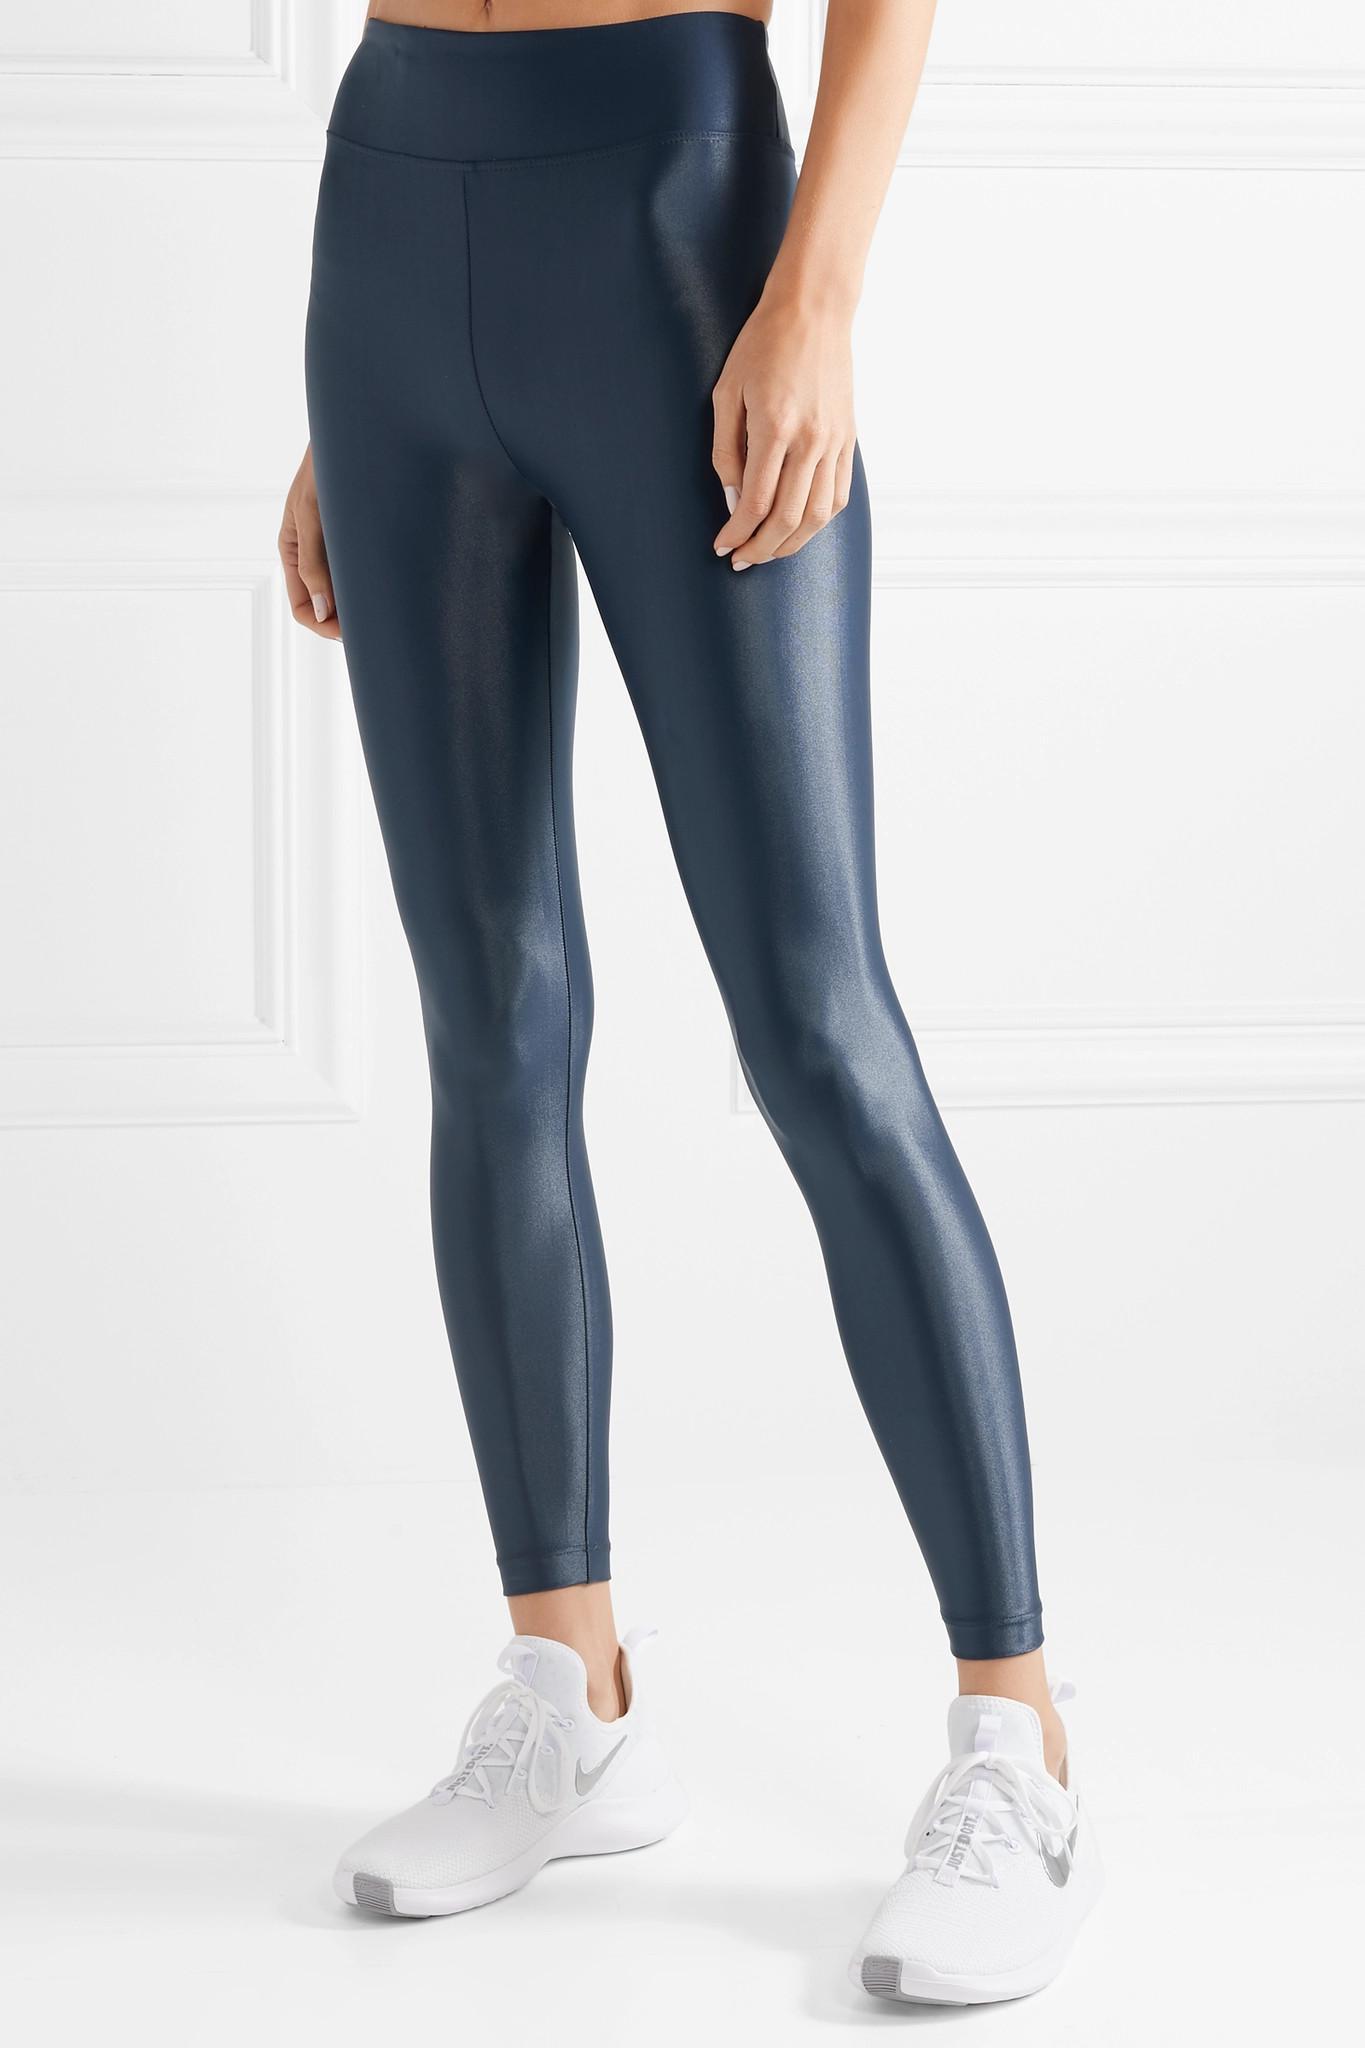 fa3781b37a274 Koral Lustrous Stretch Leggings in Blue - Lyst